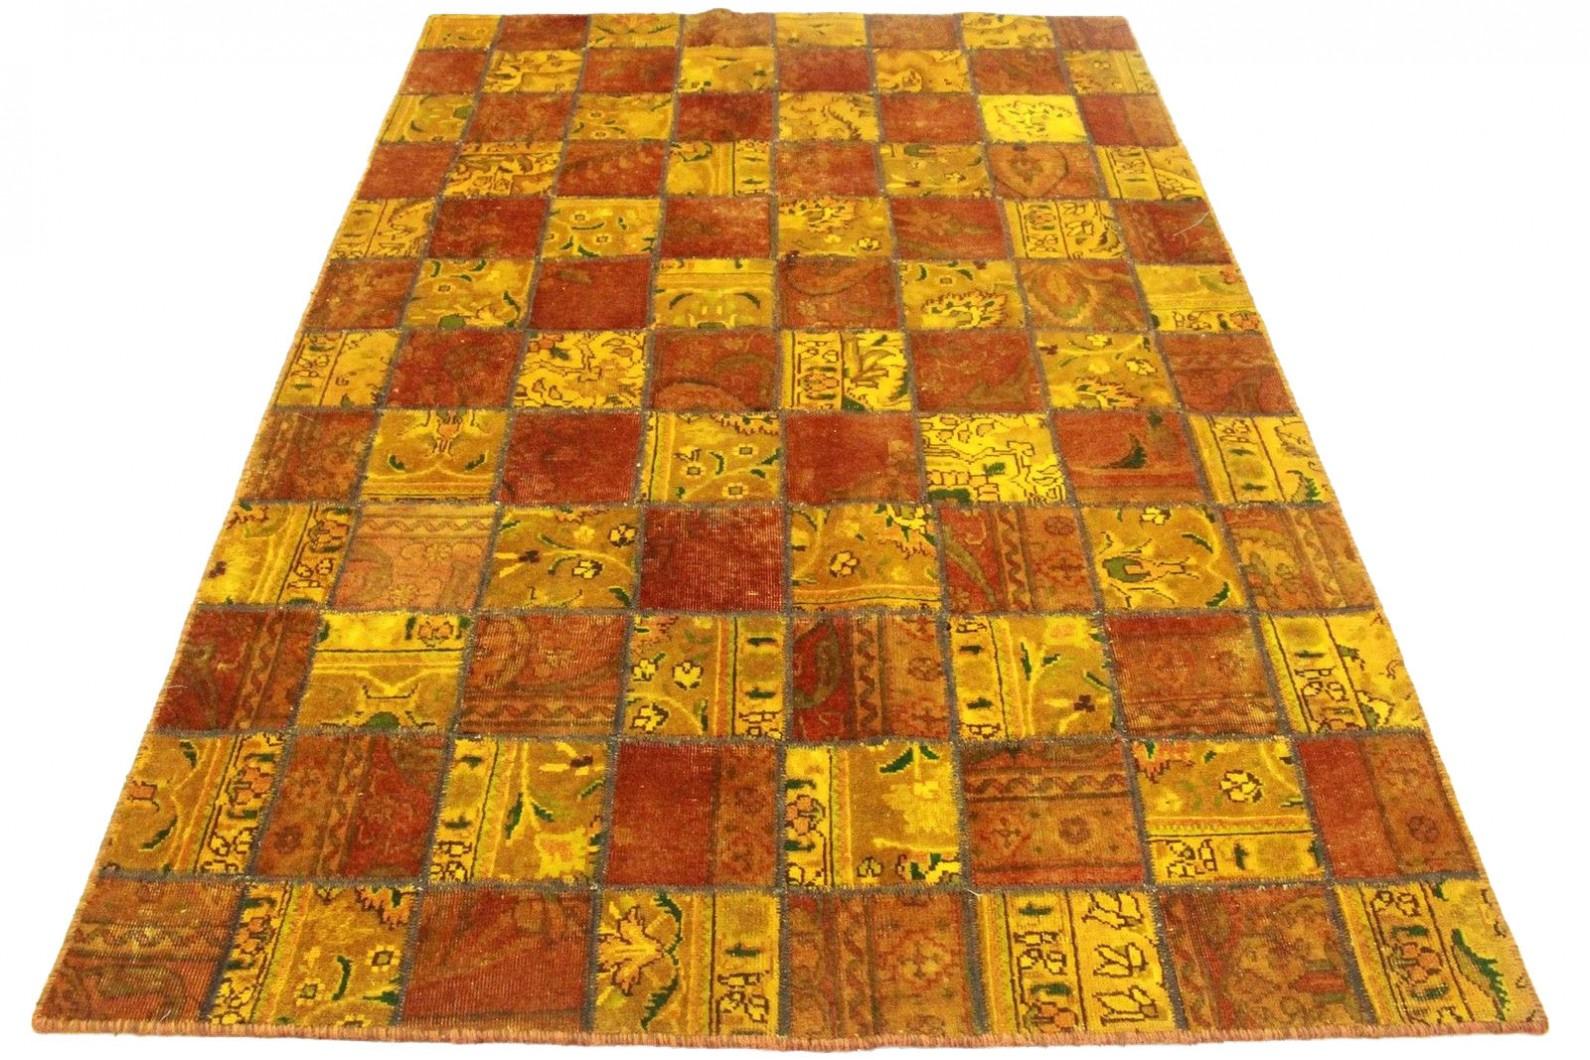 patchwork teppich orange rot in 240x160cm 1001 3669 bei. Black Bedroom Furniture Sets. Home Design Ideas